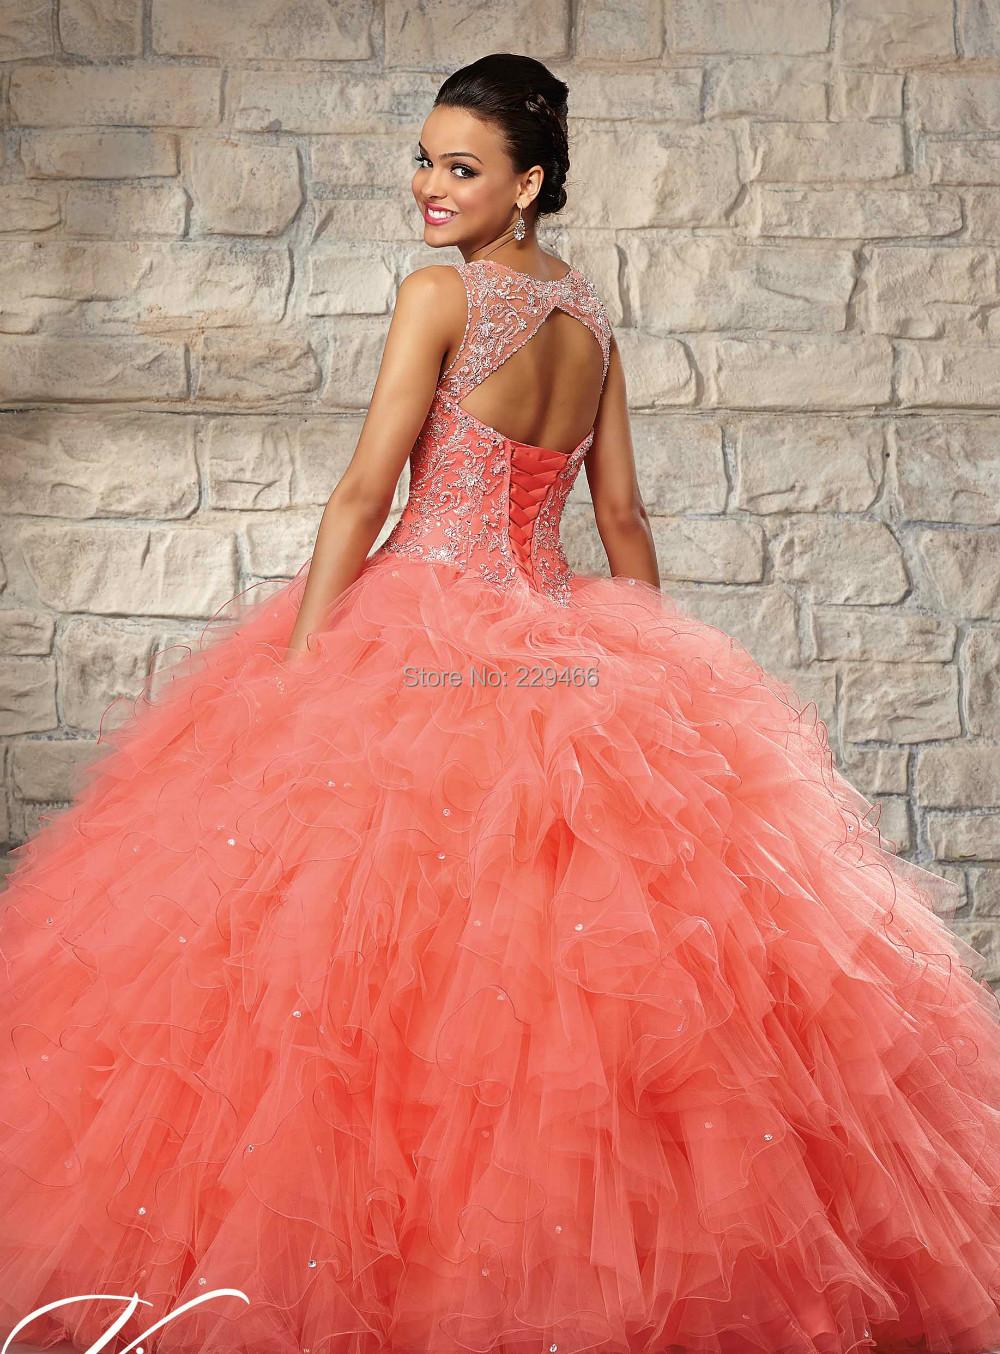 Pink Quinceanera Dress Cocktail Dresses 2016